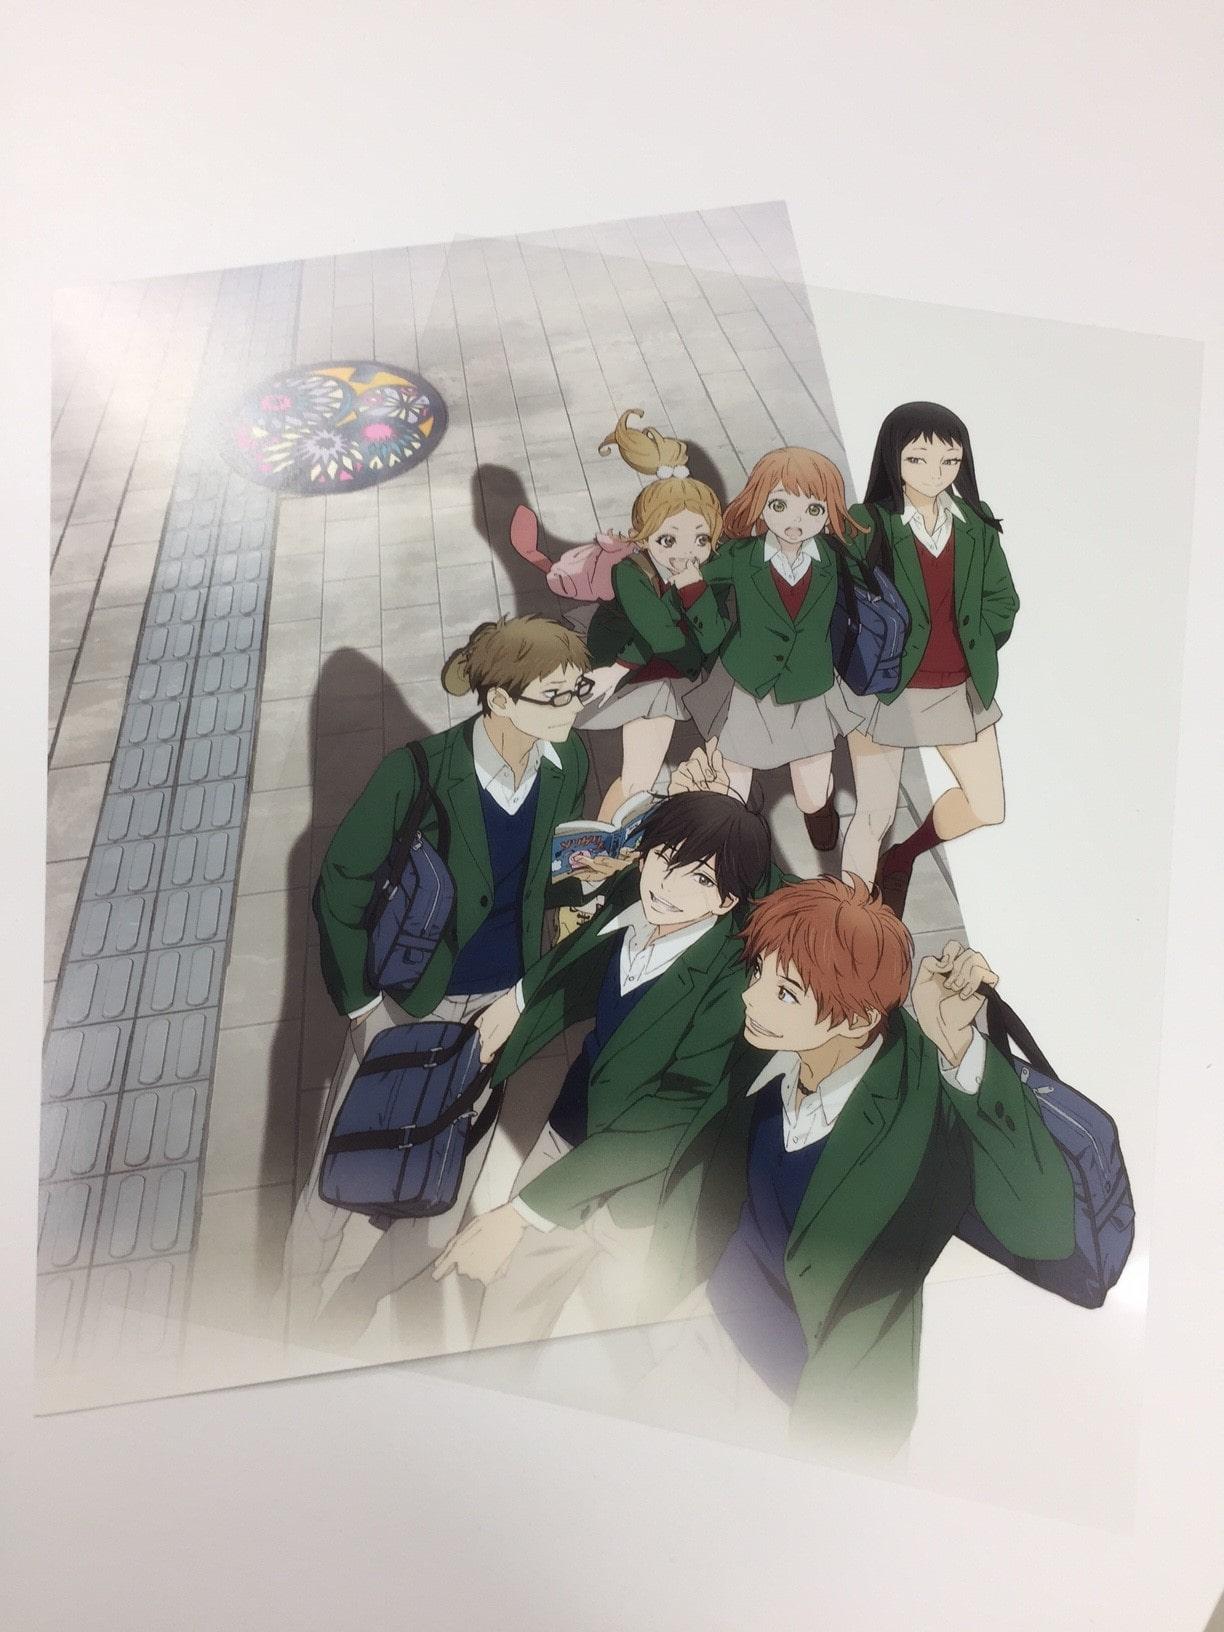 TVアニメ「orange」Vol.2 DVD 初回生産限定版